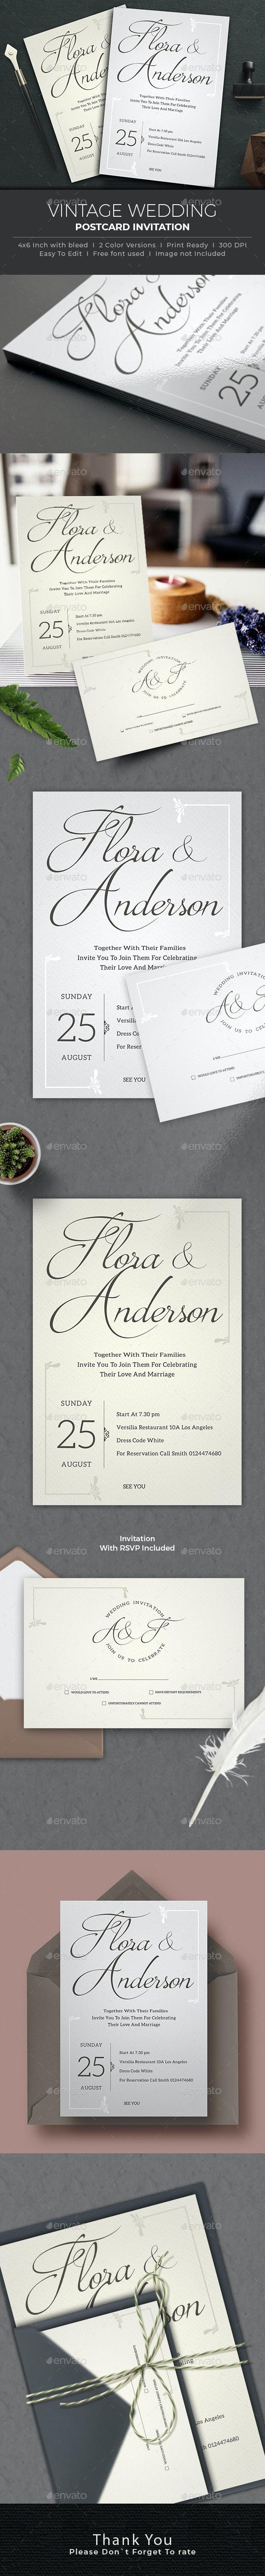 Wedding Invitation - Weddings Cards & Invites